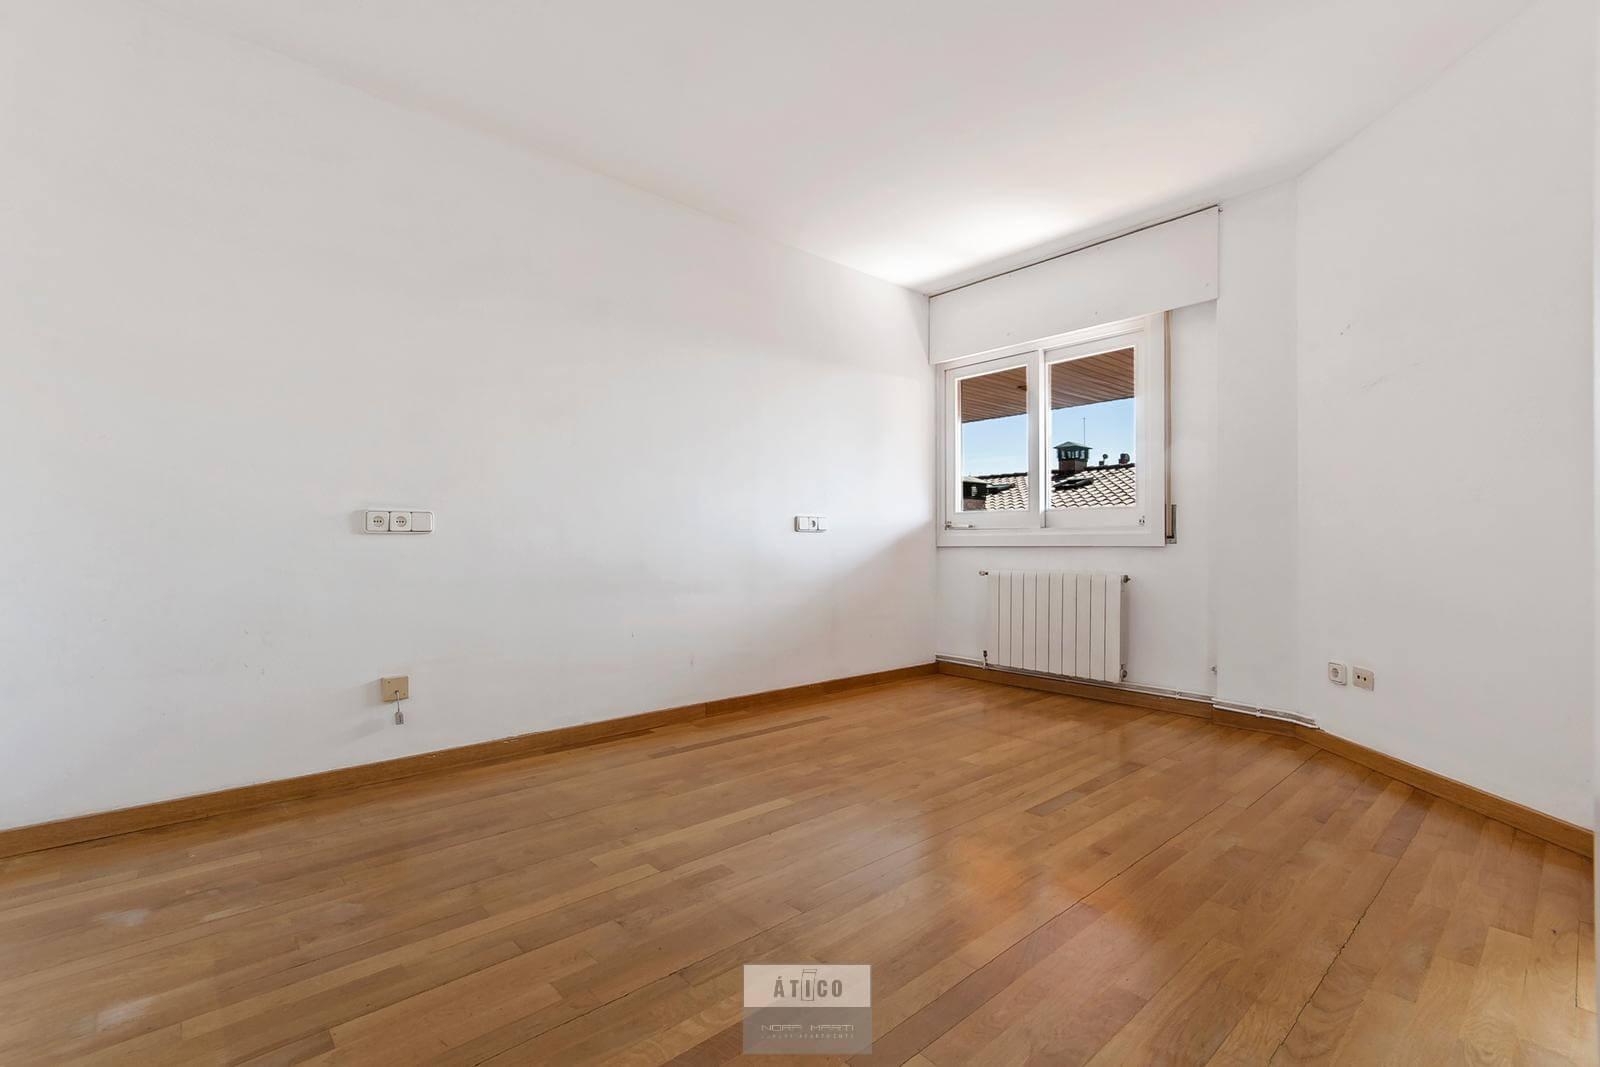 5_dormitorio_image3